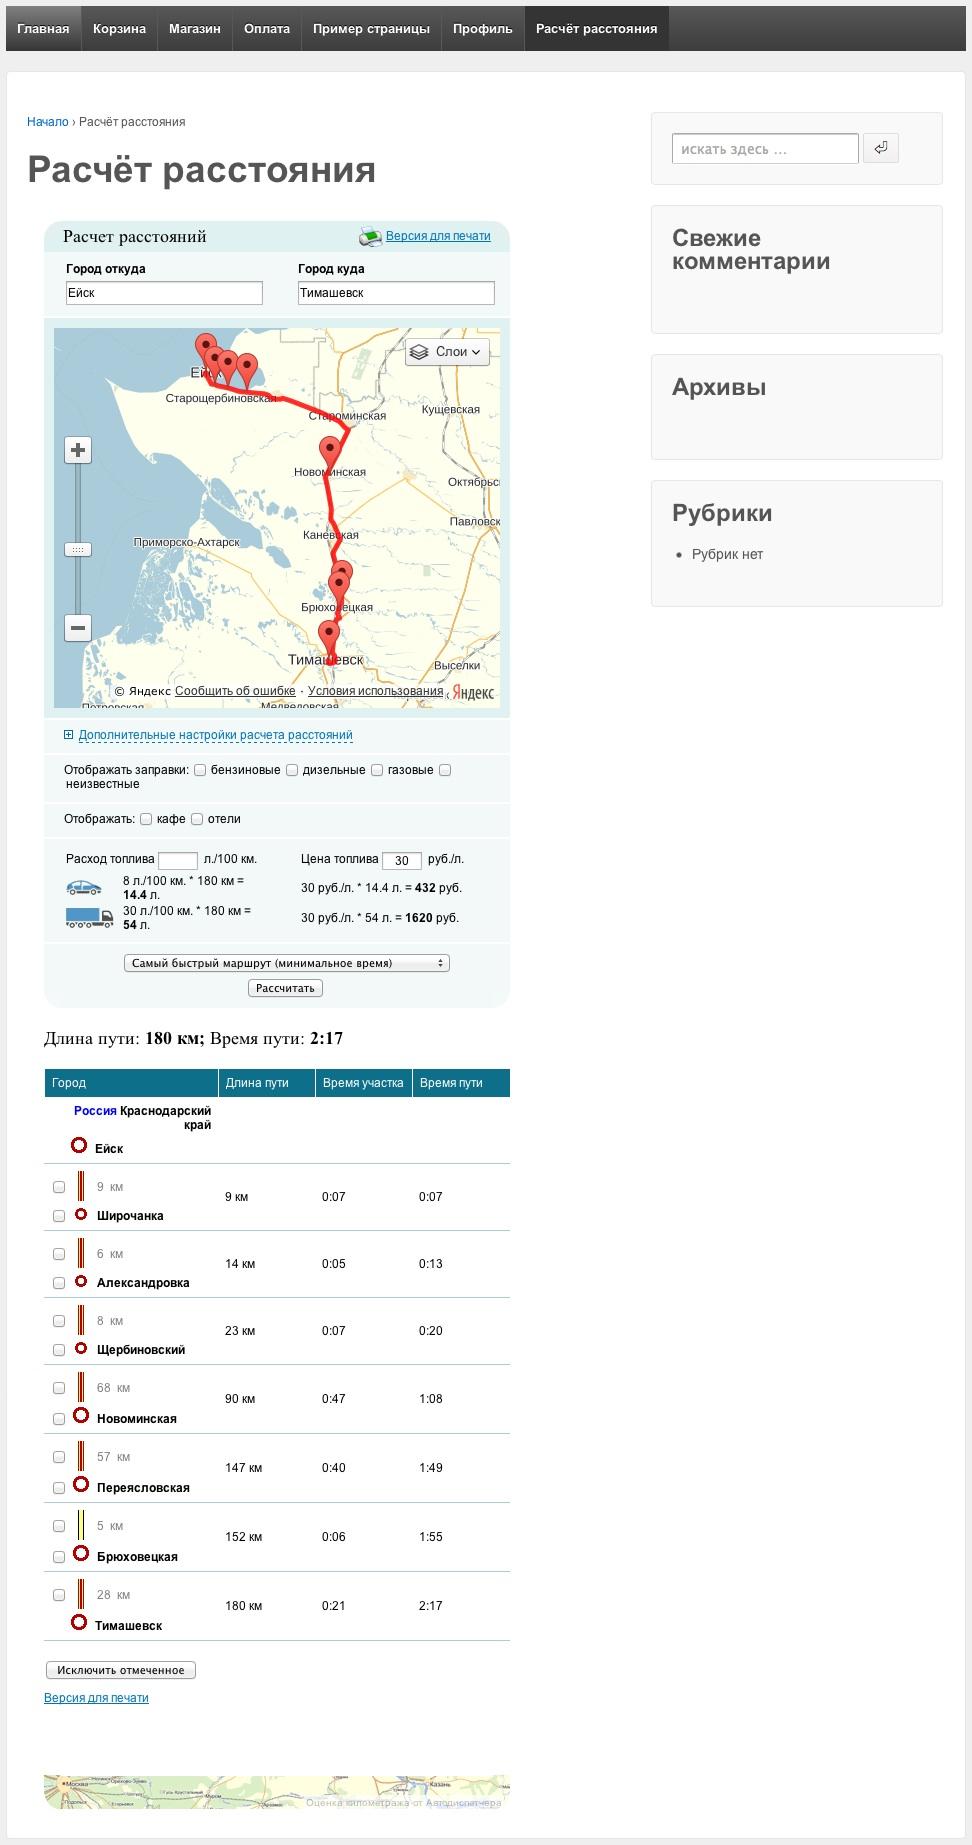 Пример маршрута: Ейск - Тимашевск